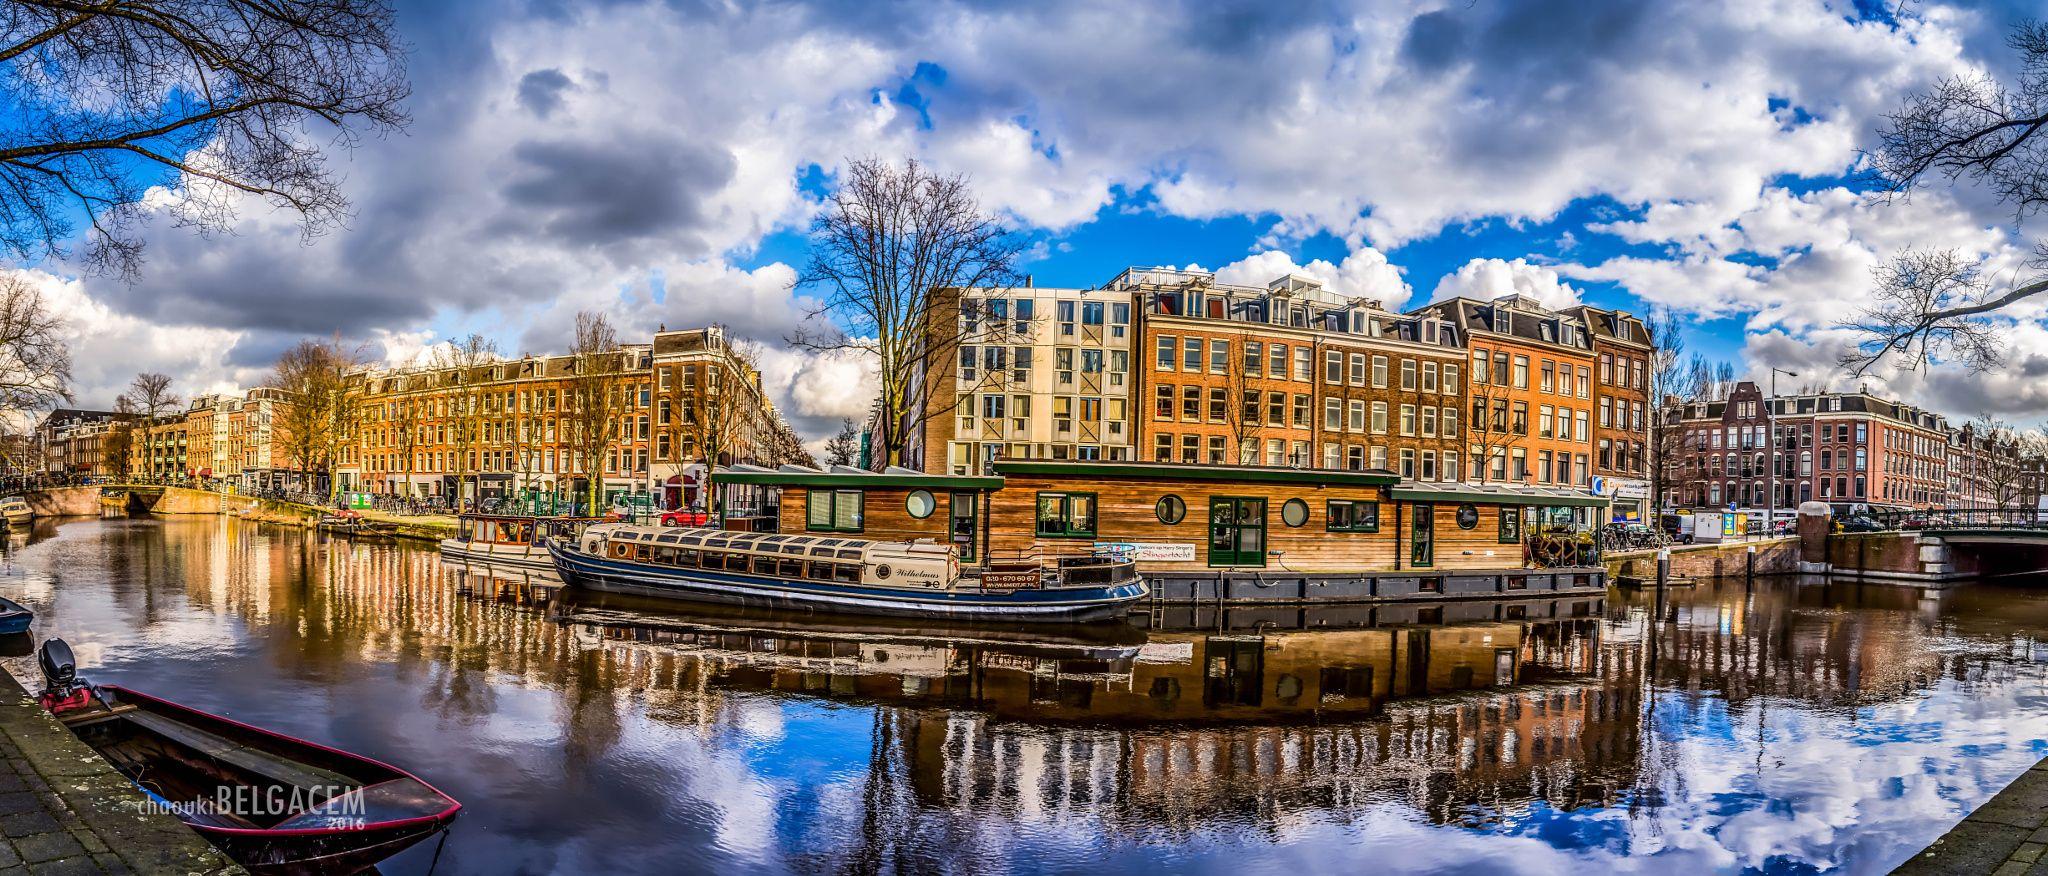 Amsterdam - Nice view of Amsterdam,